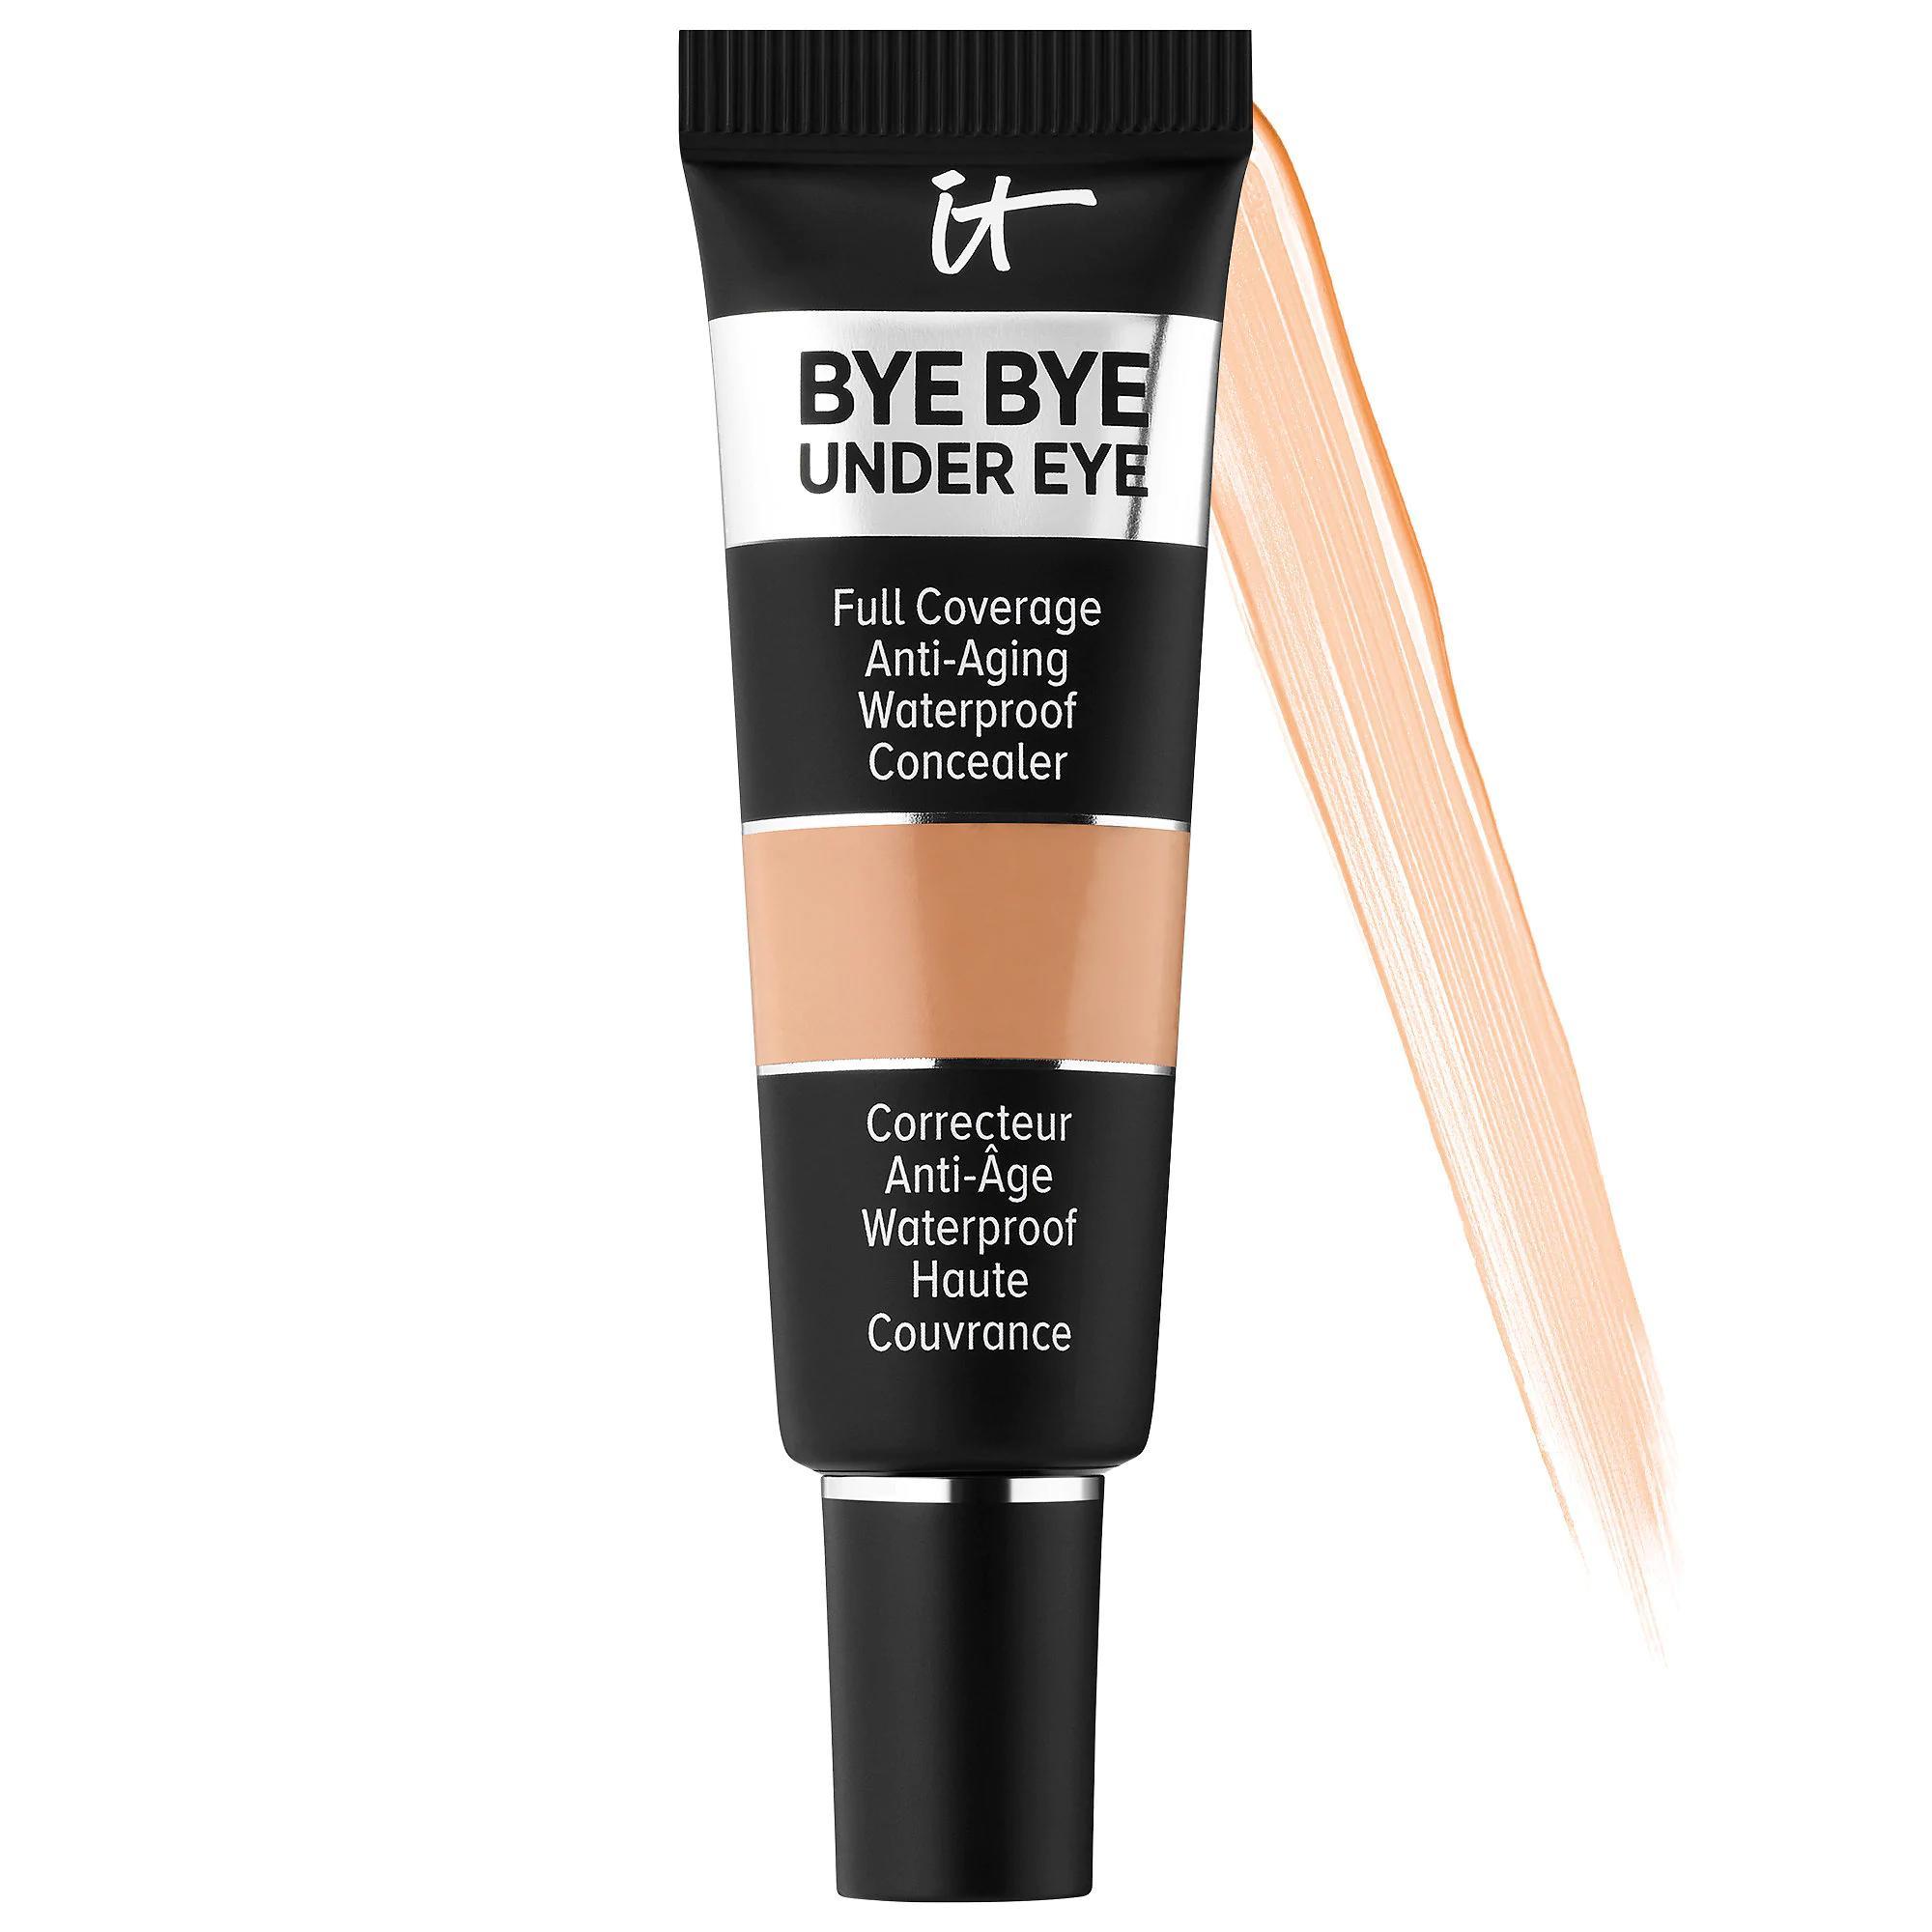 IT Cosmetics Bye Bye Under Eye Full Coverage Concealer Tan Sand 31.0